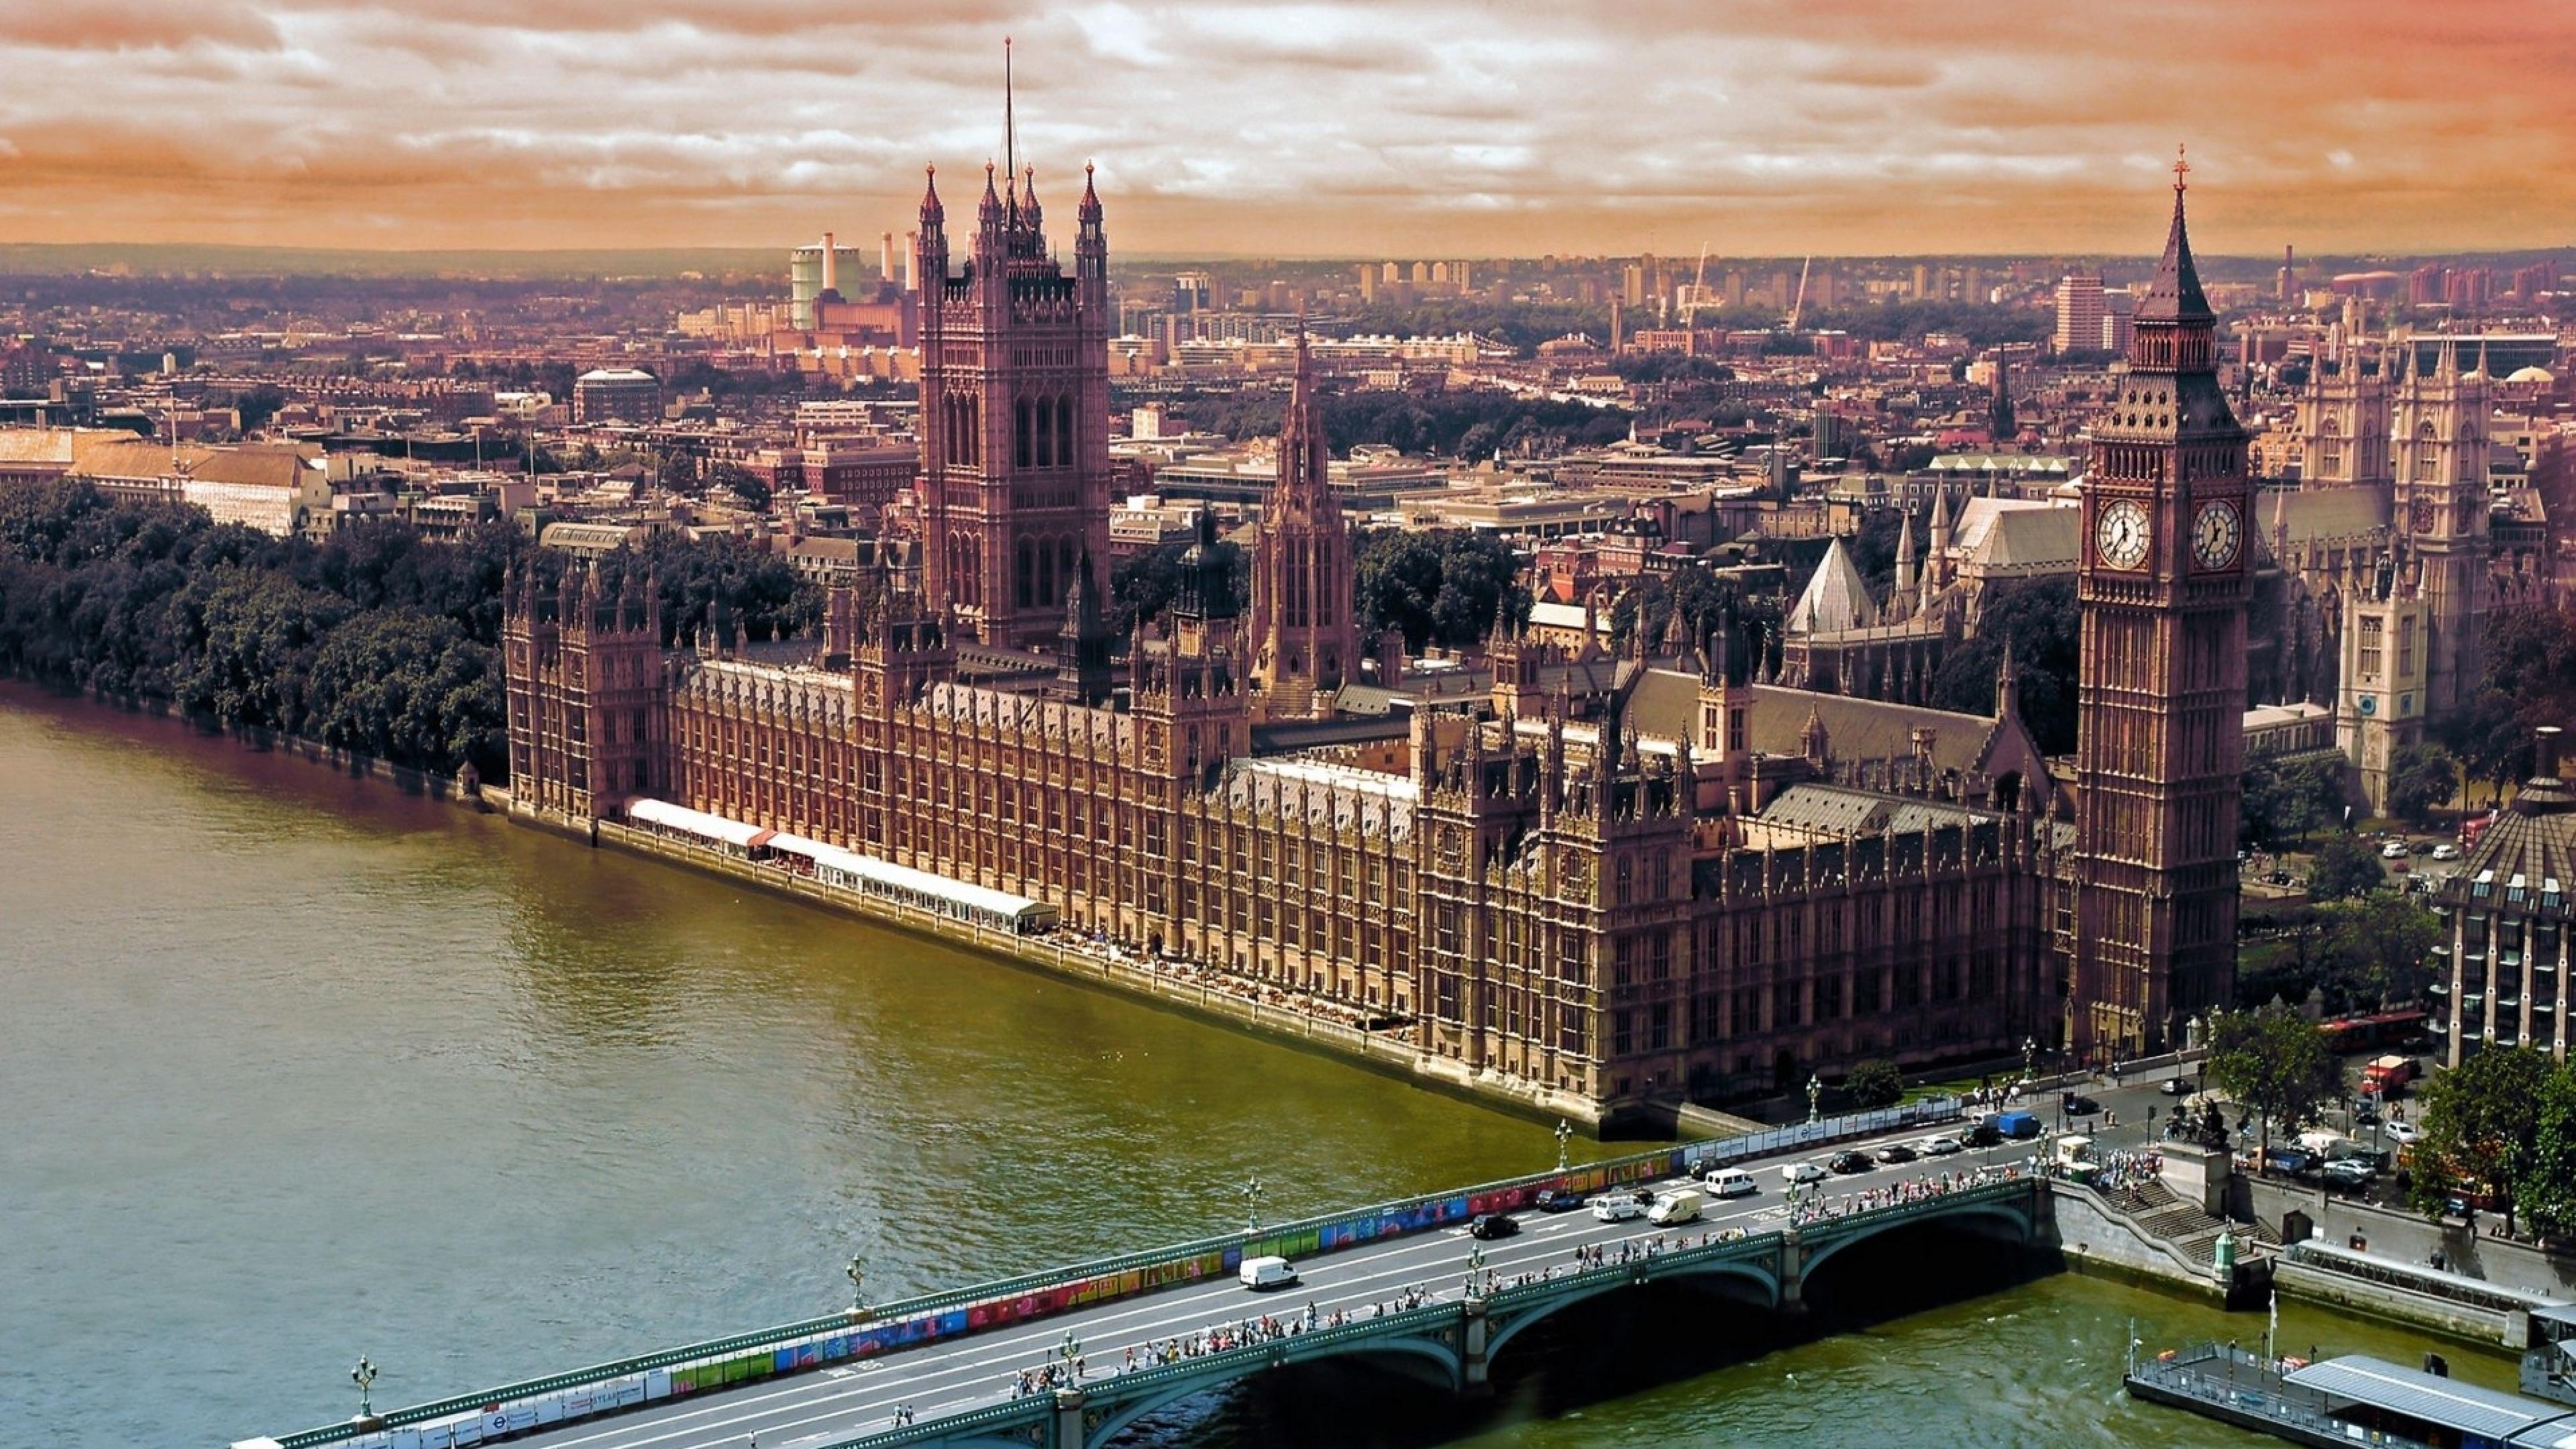 London Top view Bridge Big ben Wallpaper Background 4K Ultra HD 3840x2160